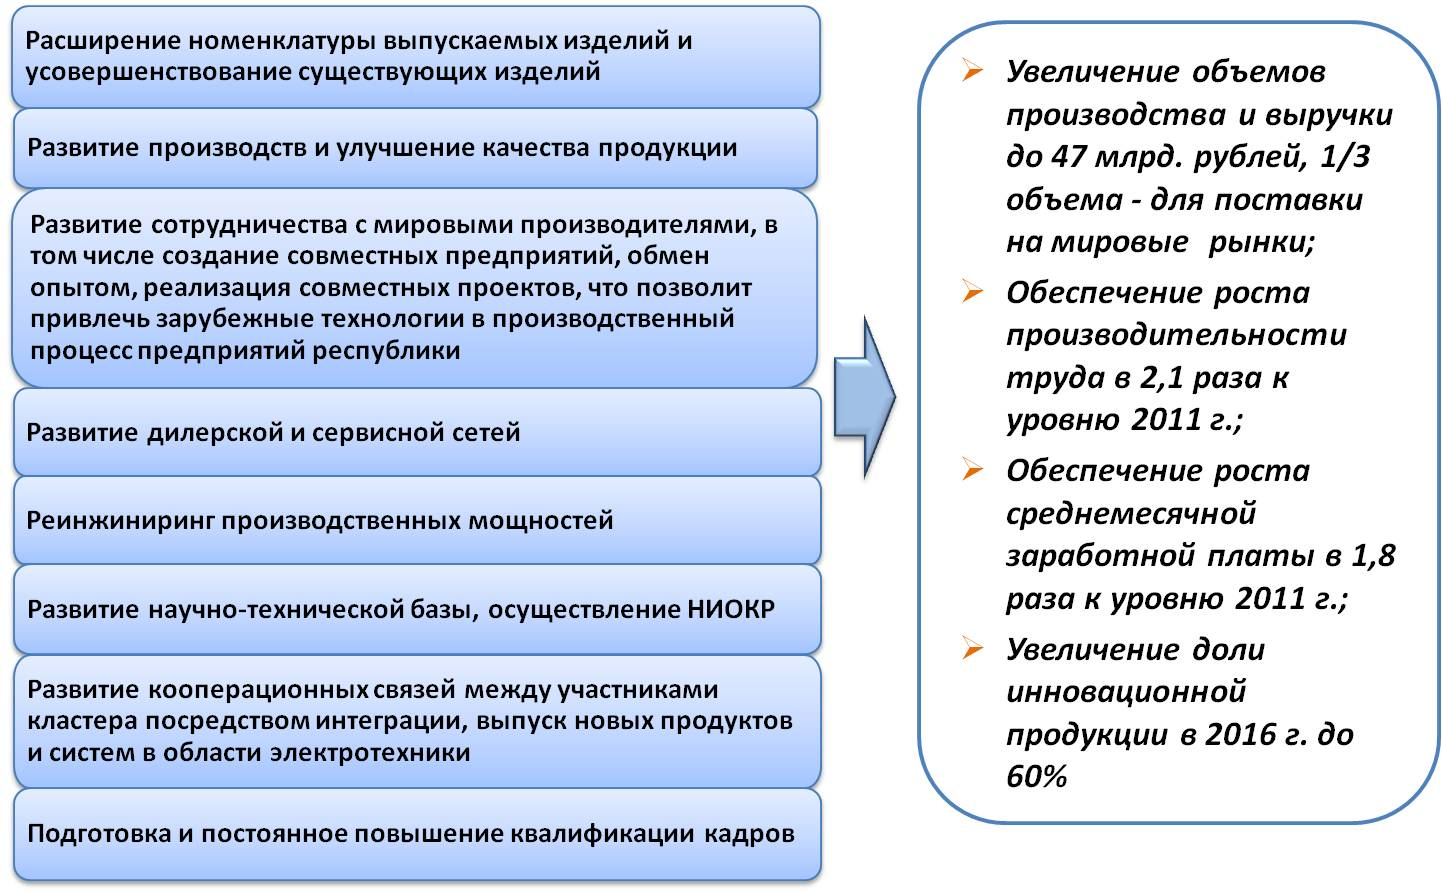 Perspektivi_razvitija-1358420171-0